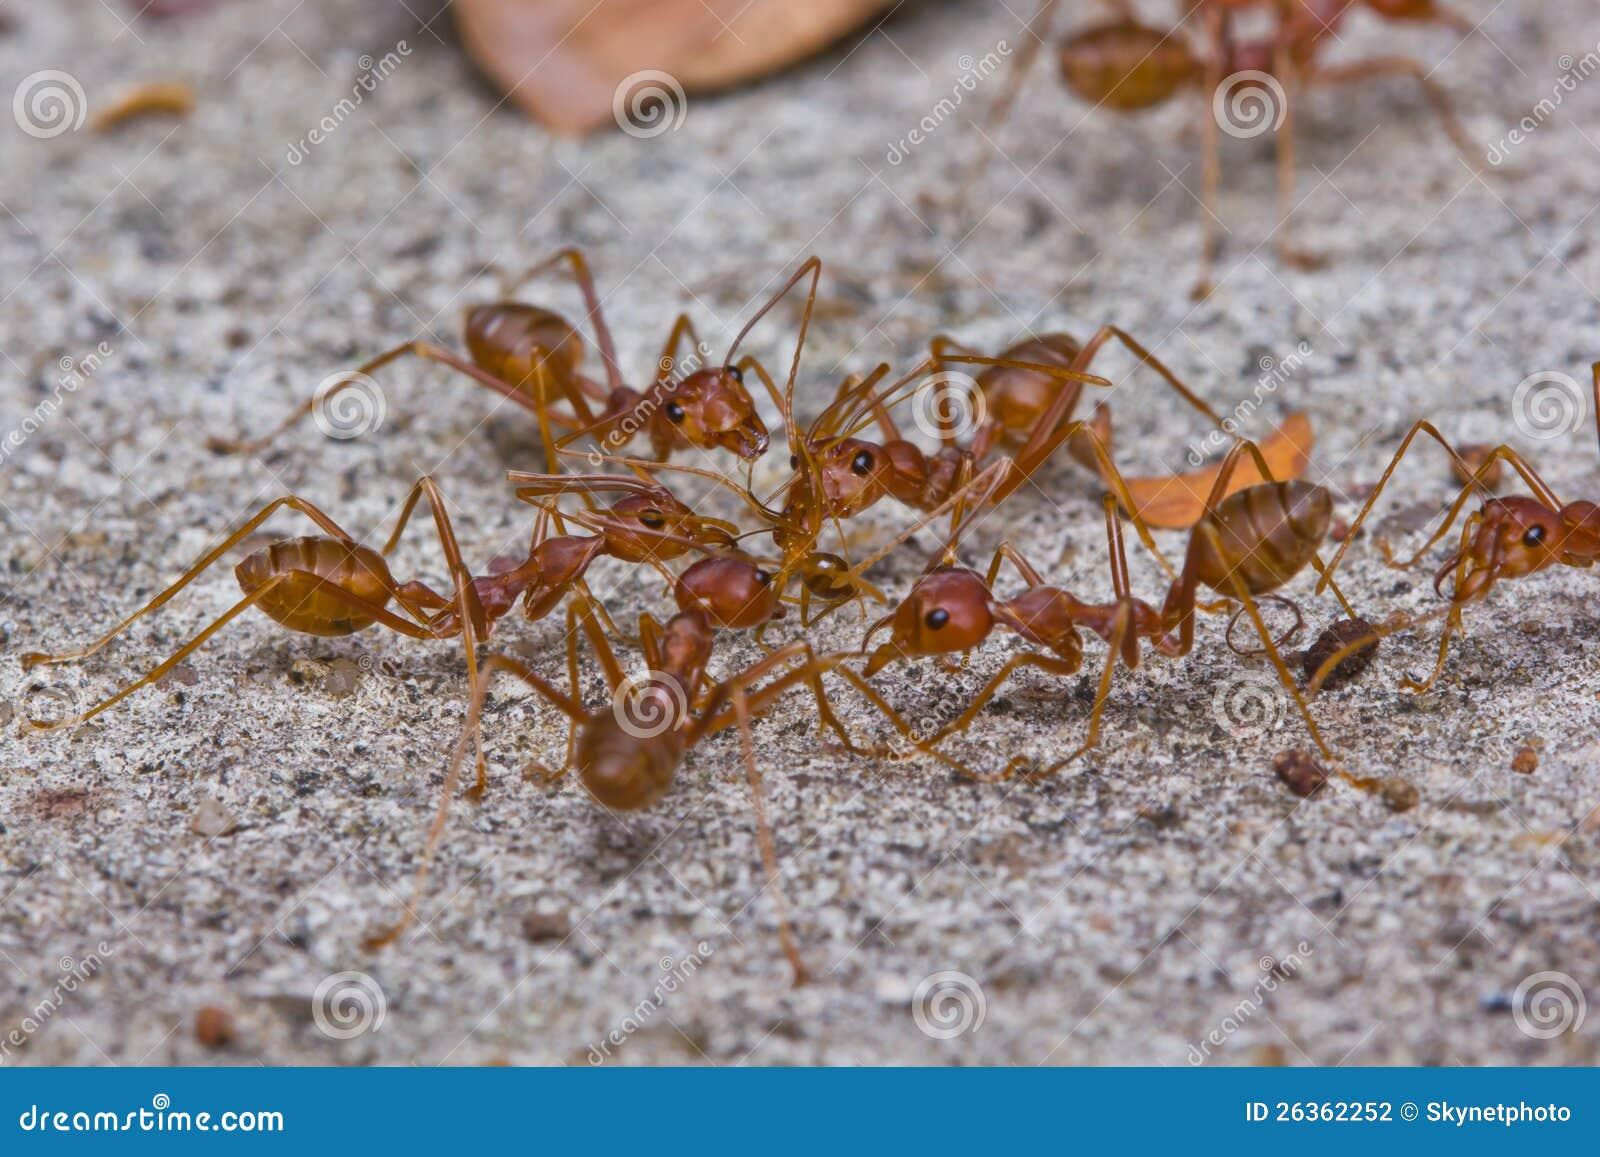 Rote Ameisen